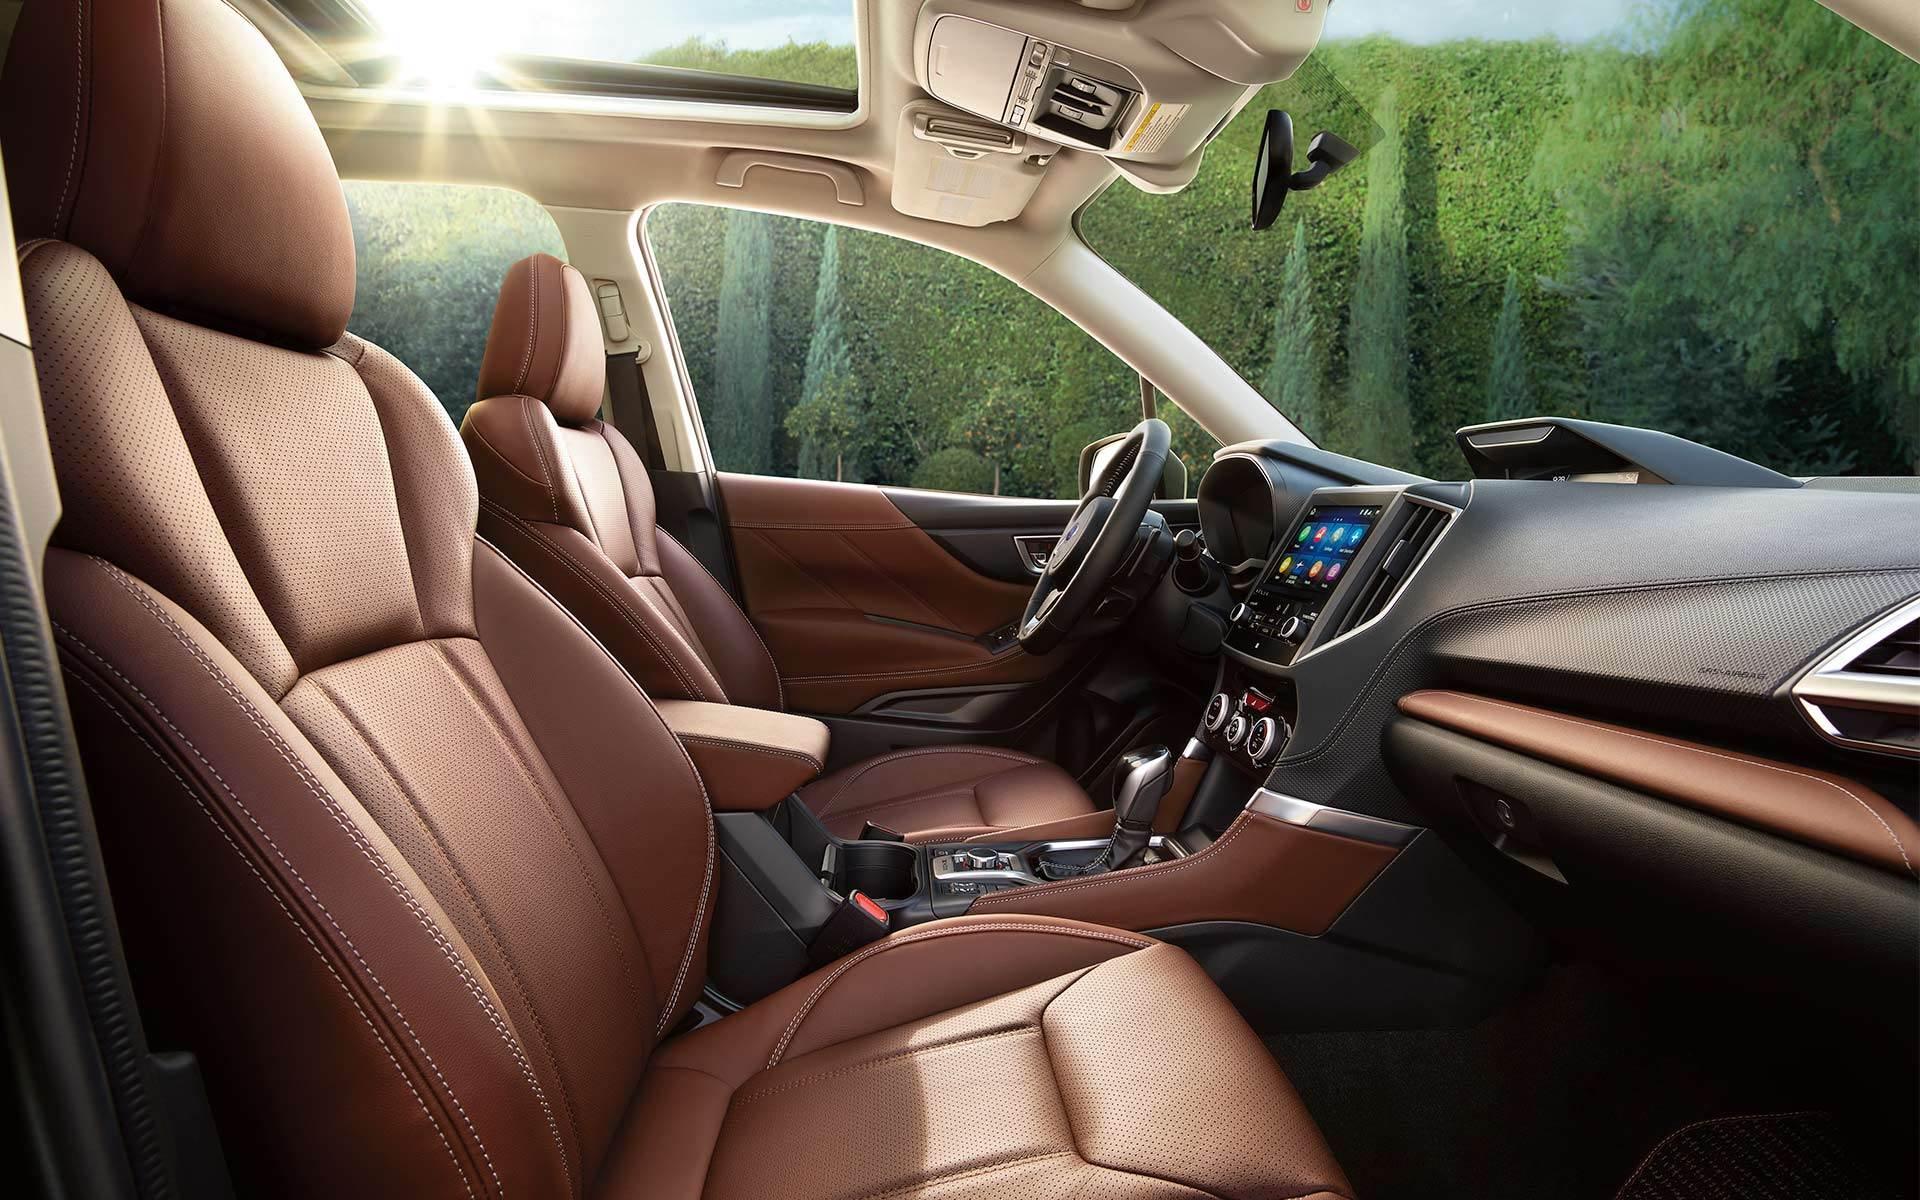 2020 Subaru Forester Bergen County NJ